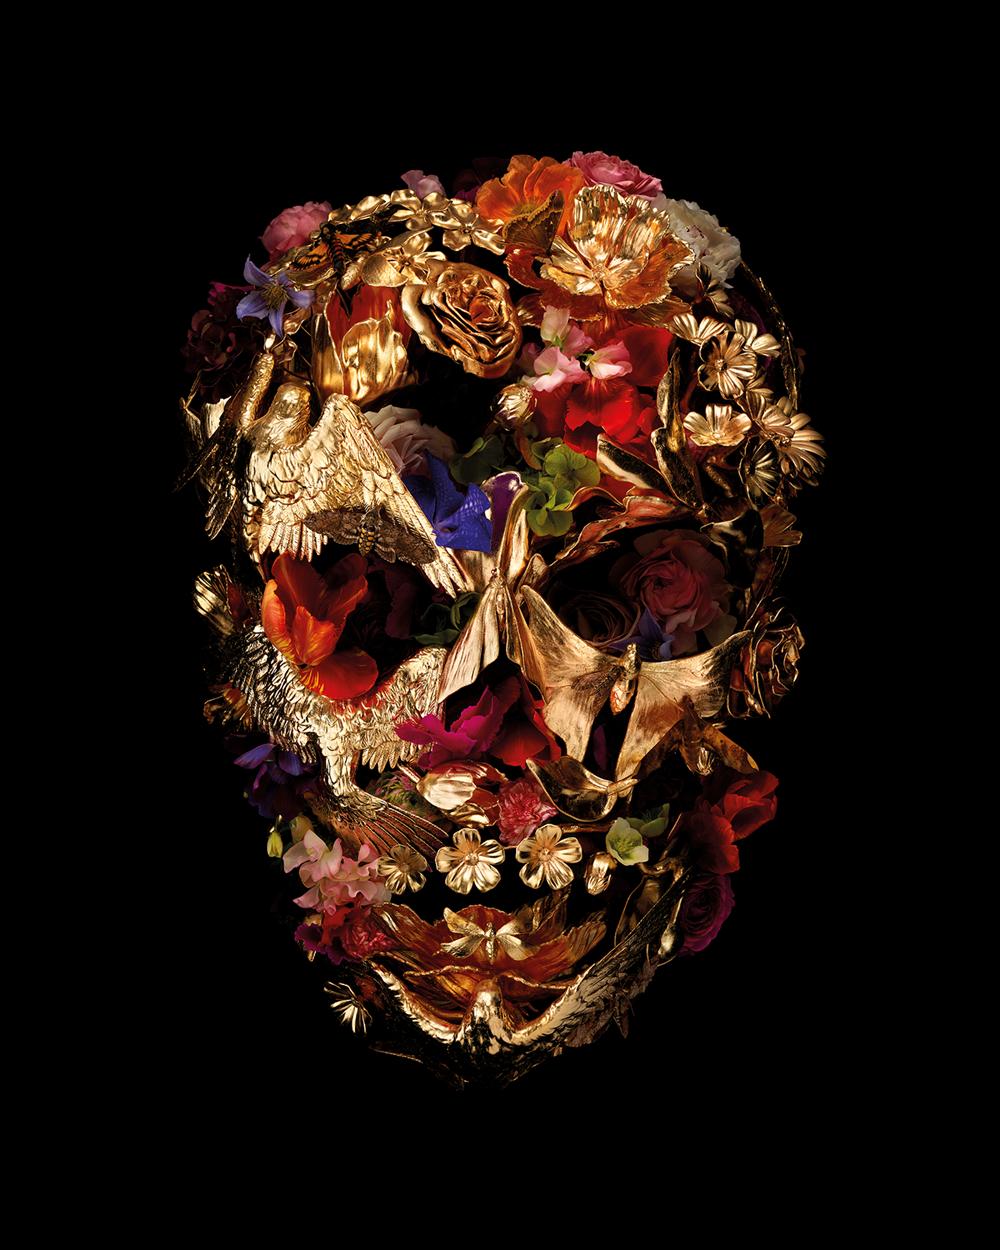 Future Dreams - Lot 16, Gary James McQueen, The Vanitas Skull